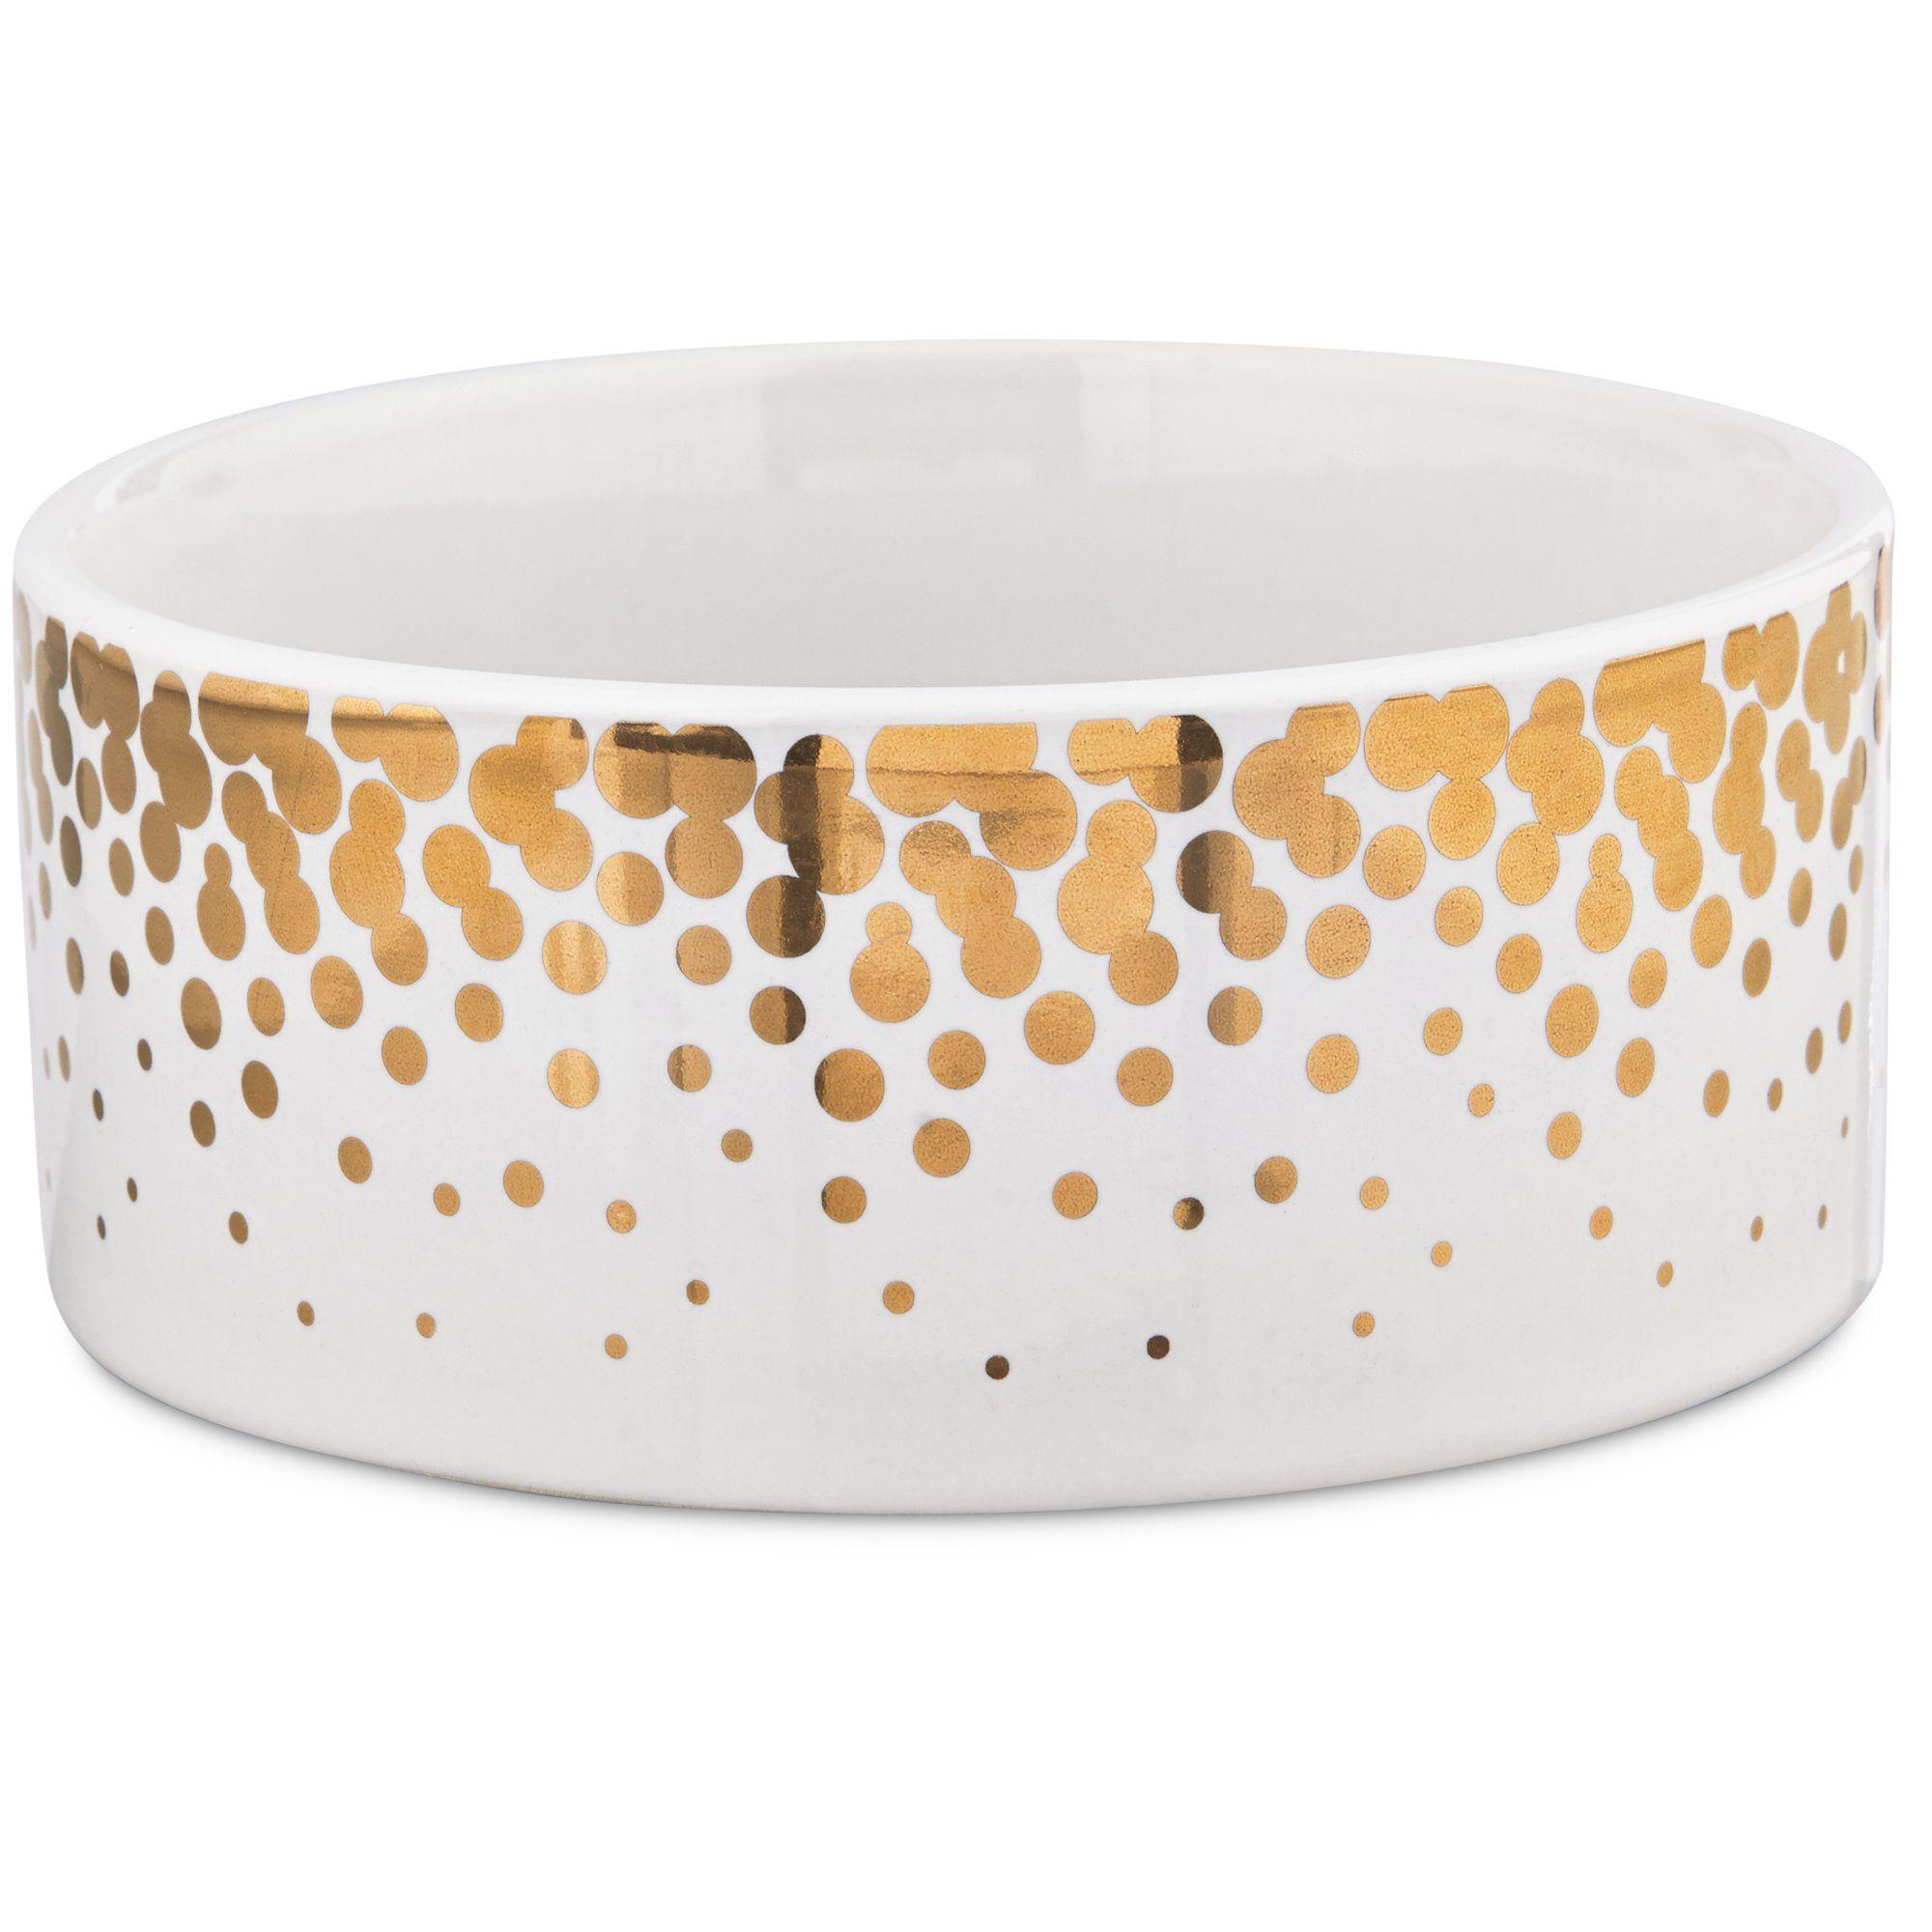 Harmony Gold Dots Ceramic Dog Bowl 1 Cup Ceramic Dog